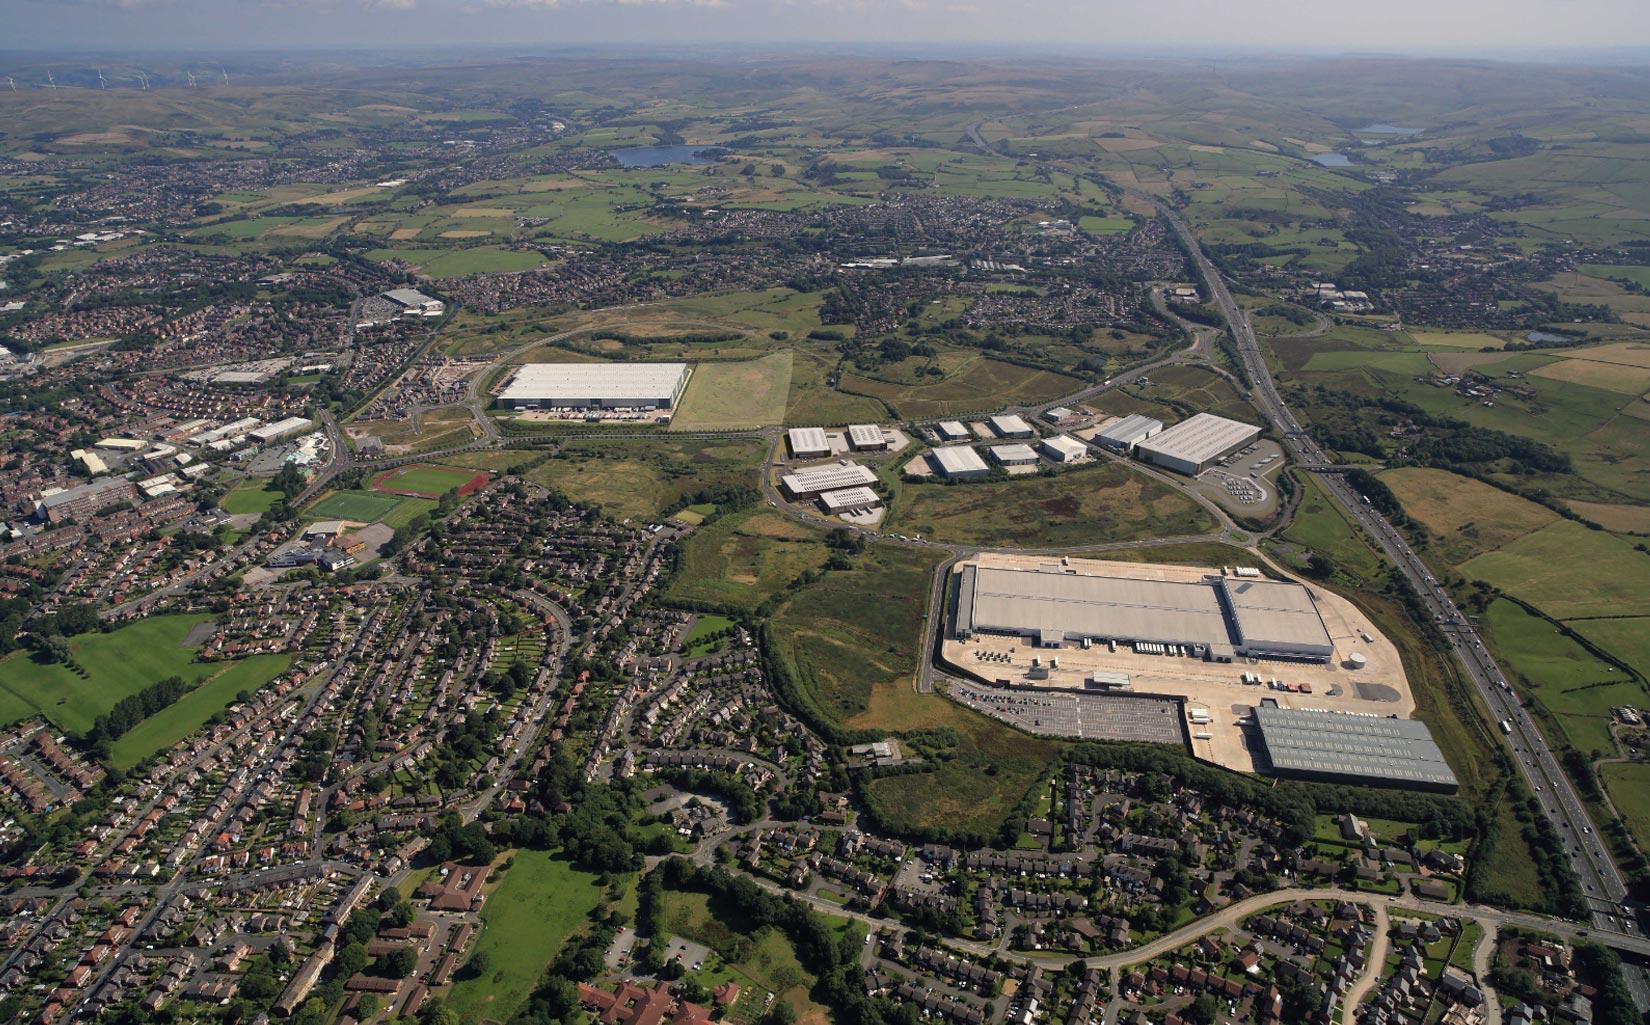 Kingsway Business Park, Milnrow, Rochdale, Aerial